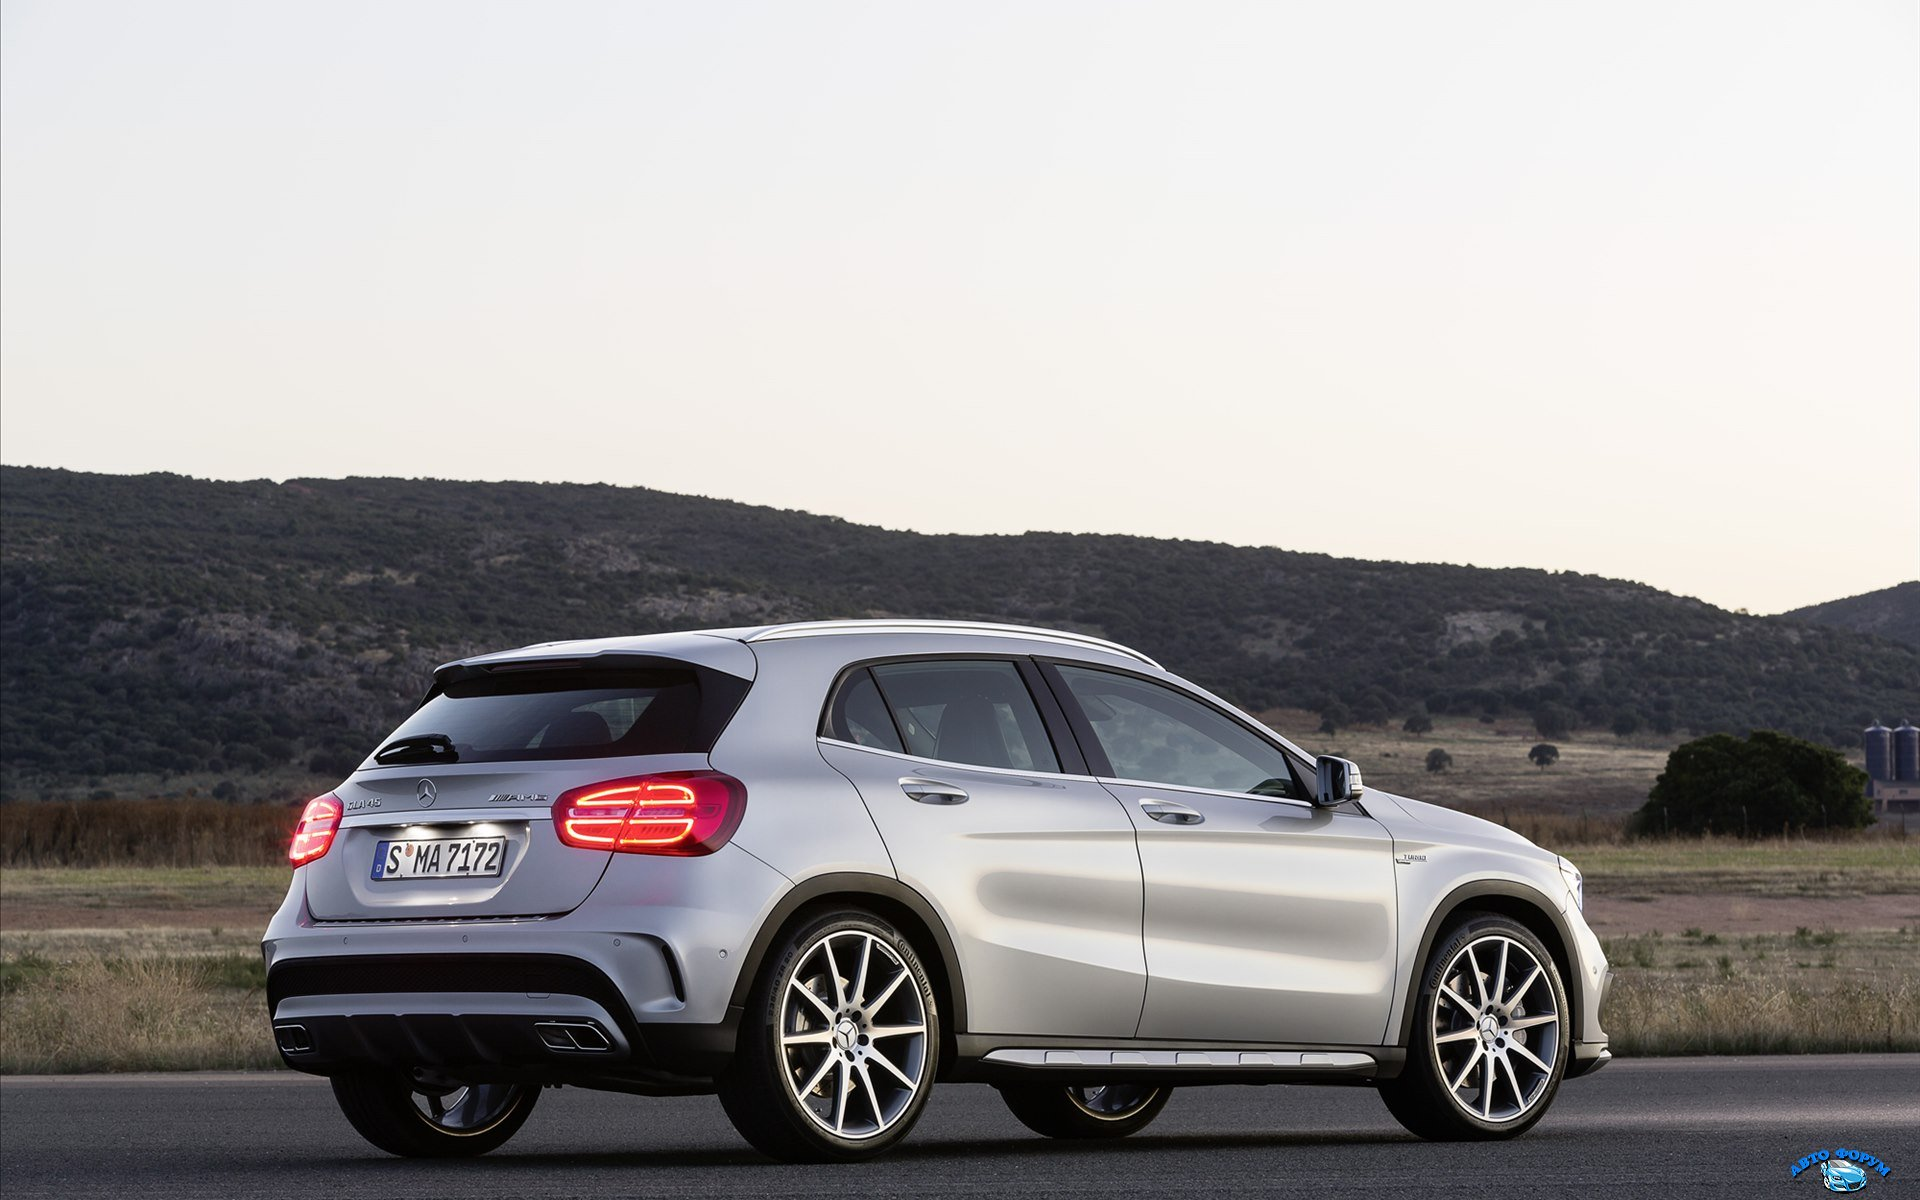 Mercedes-Benz-GLA-45-AMG-2014-widescreen-02.jpg